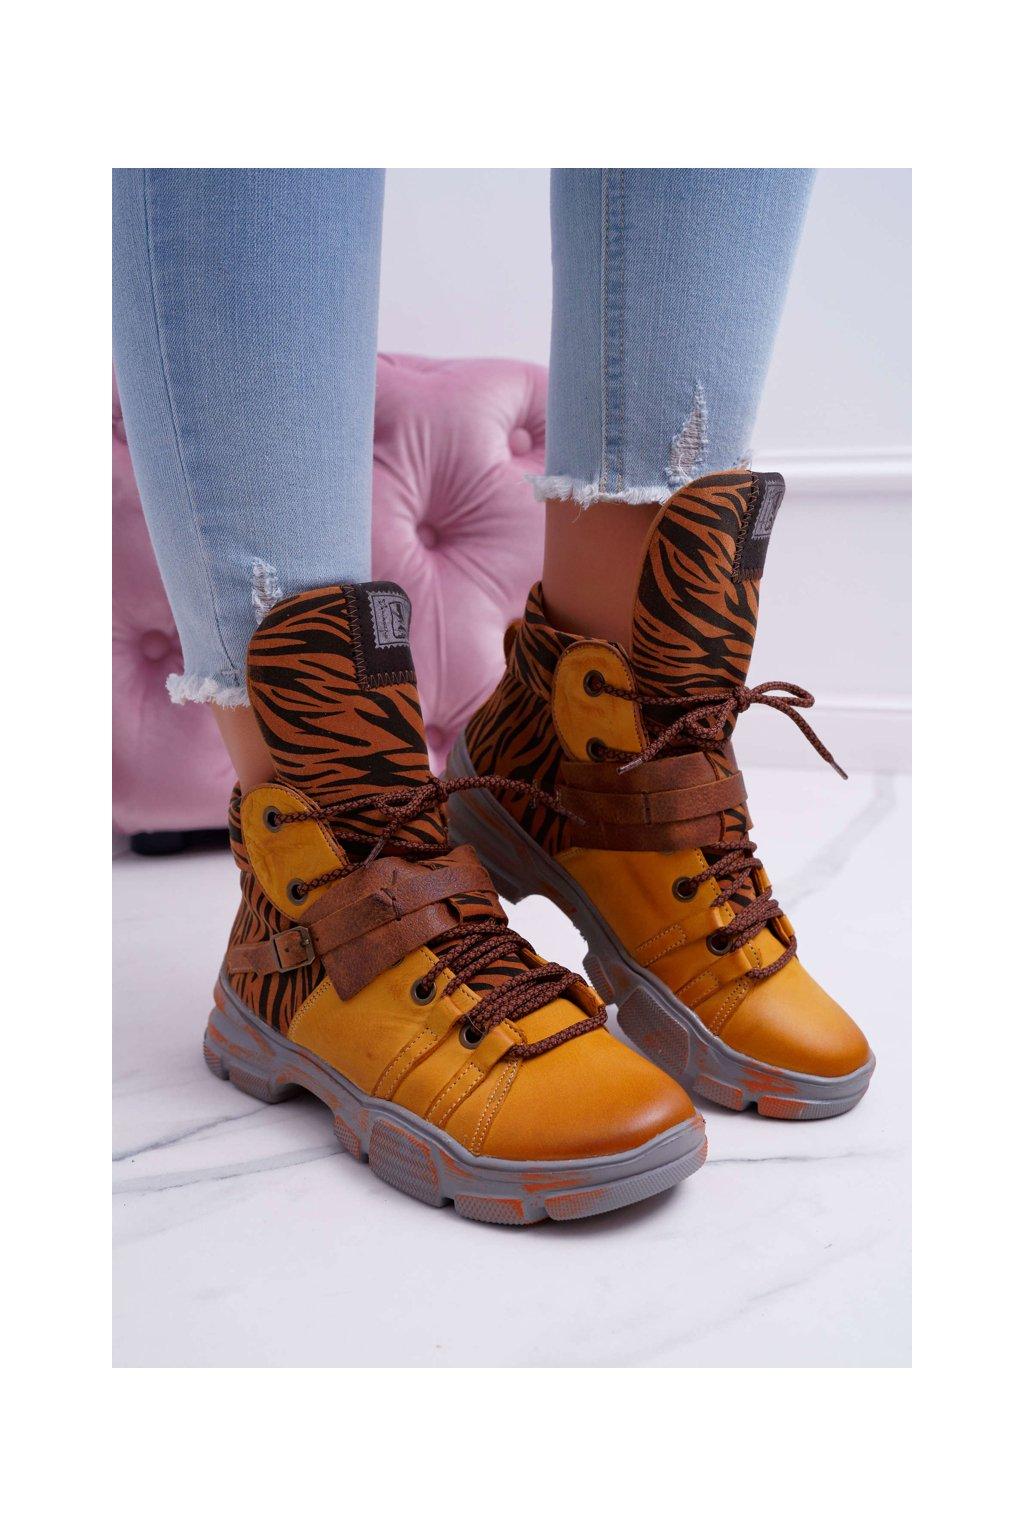 Dámske topánky Majka Kožené žlté 04218